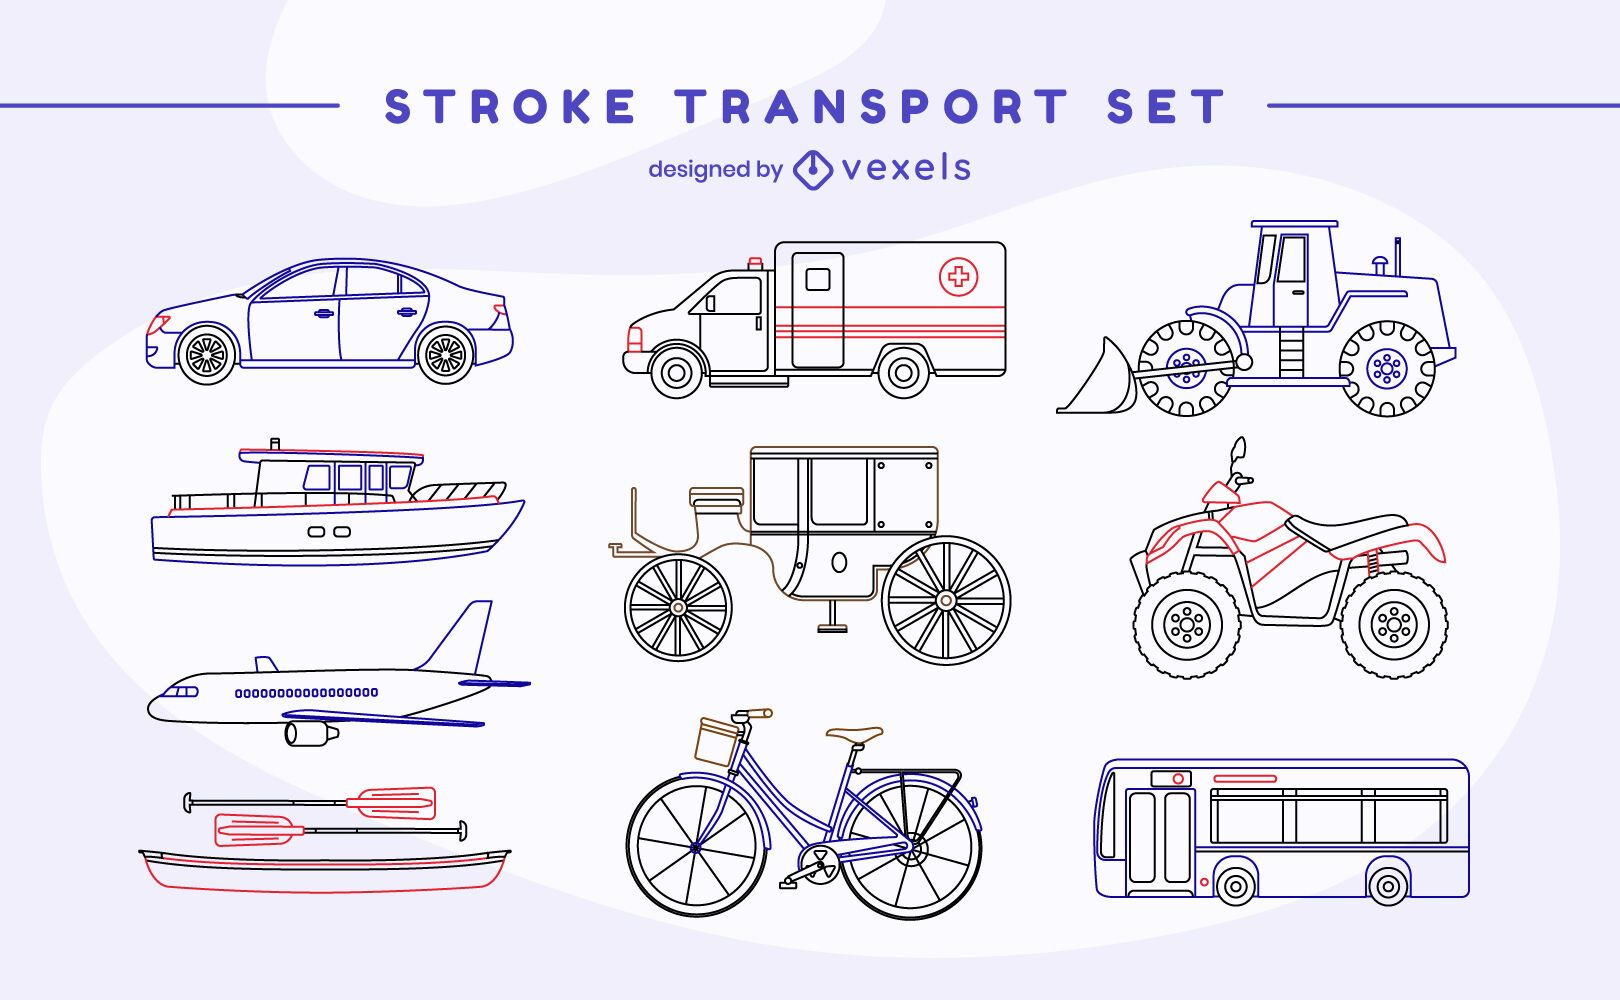 Vehicle transport stroke set